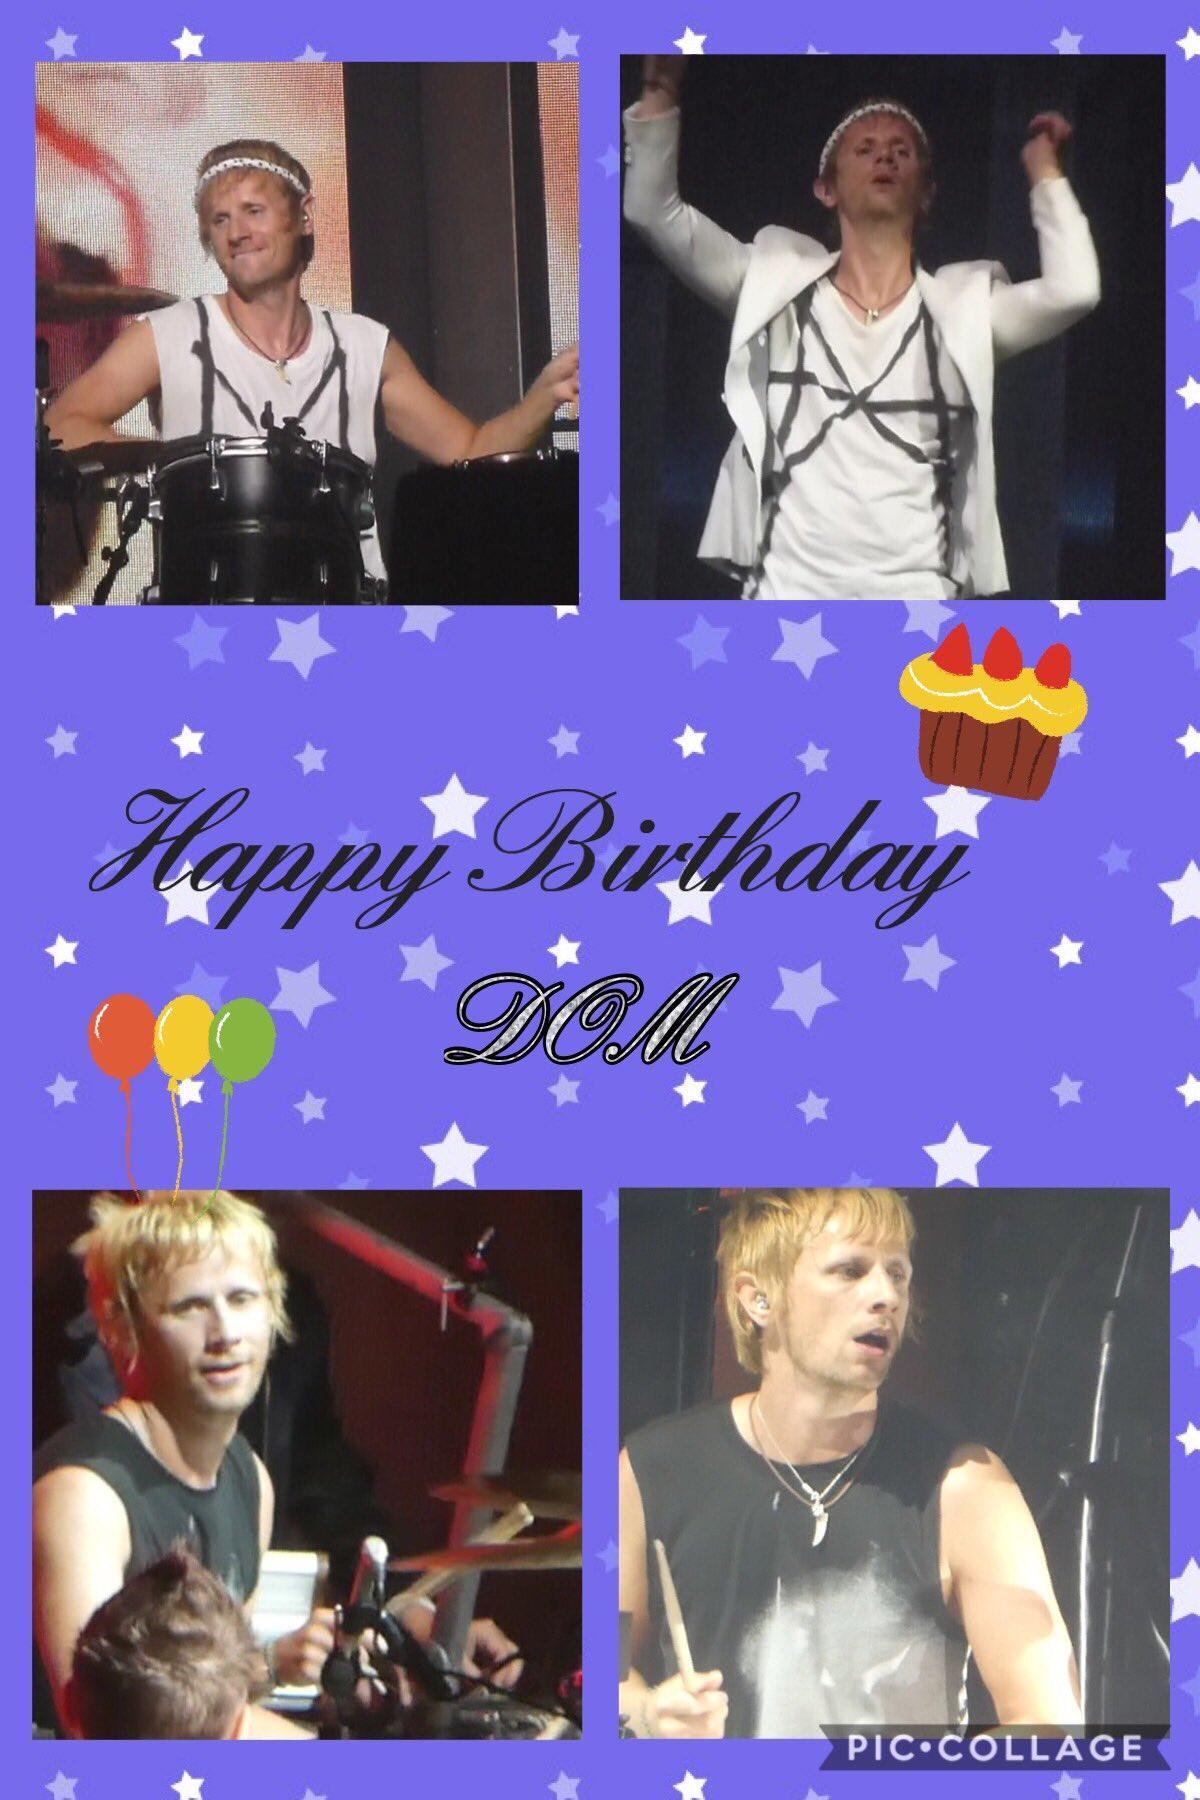 Happy Birthday Dom   Wishing you many, many more happiness!!